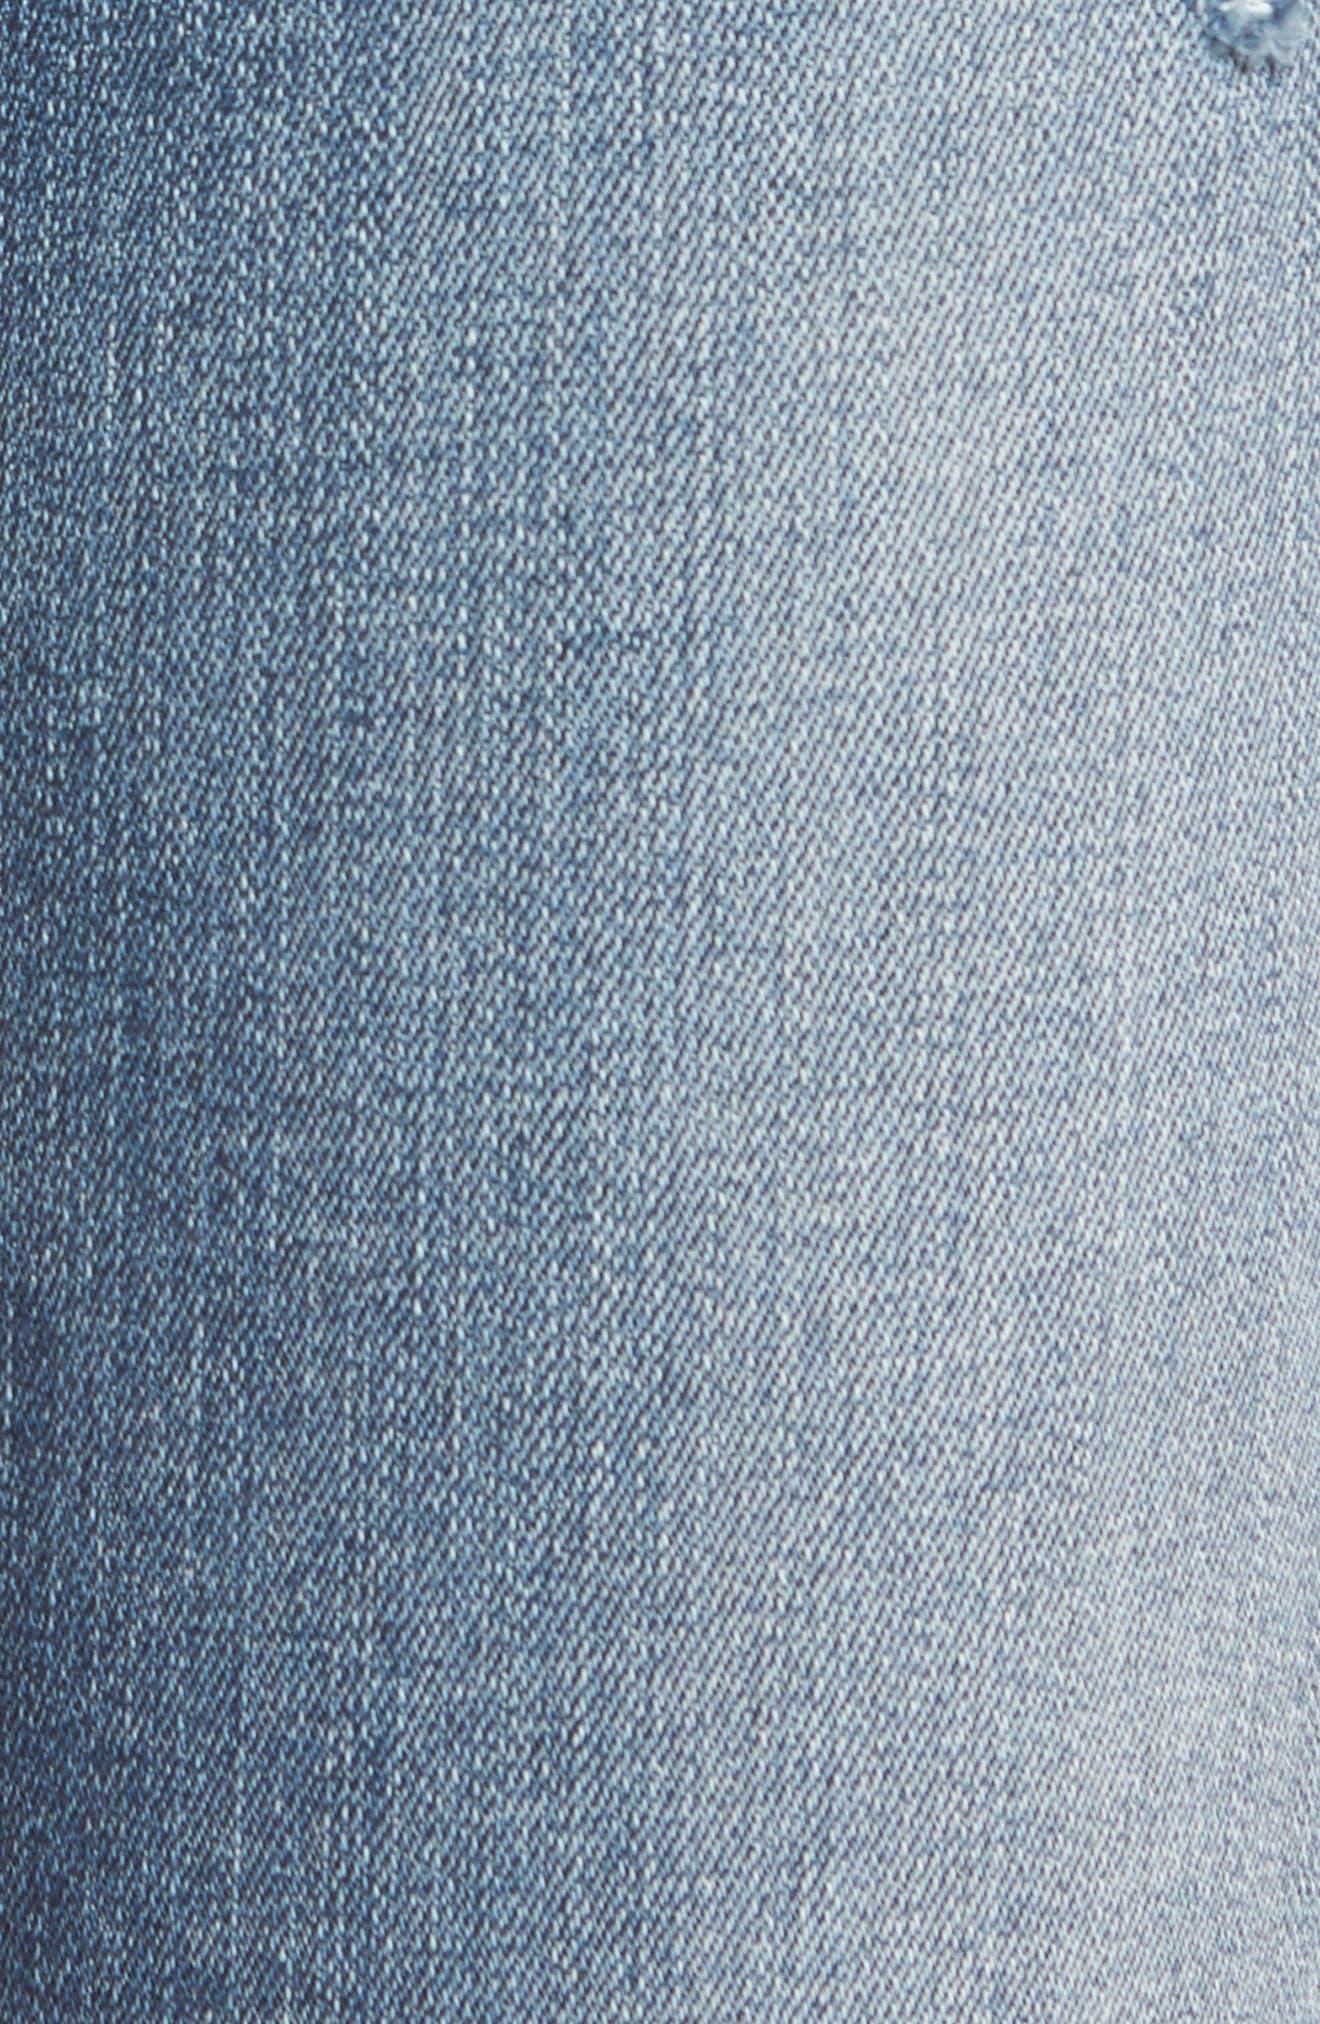 Taylor Colorblock Straight Leg Jeans,                             Alternate thumbnail 5, color,